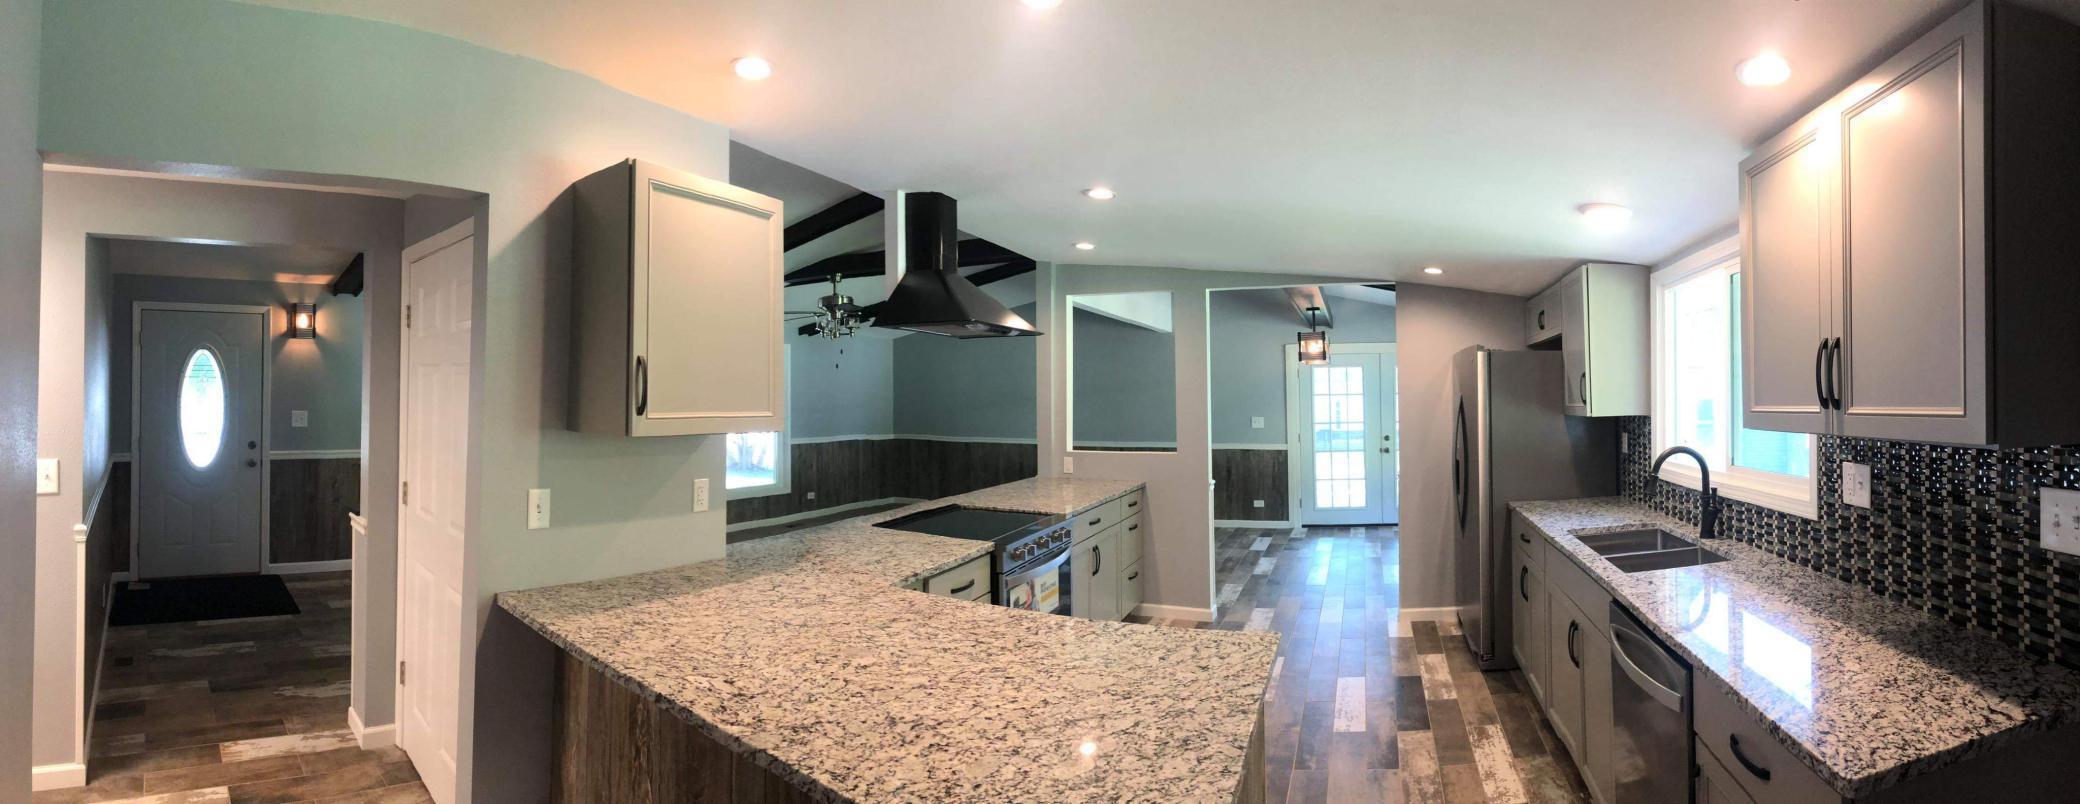 1240 Main Property Photo - Elba, MN real estate listing